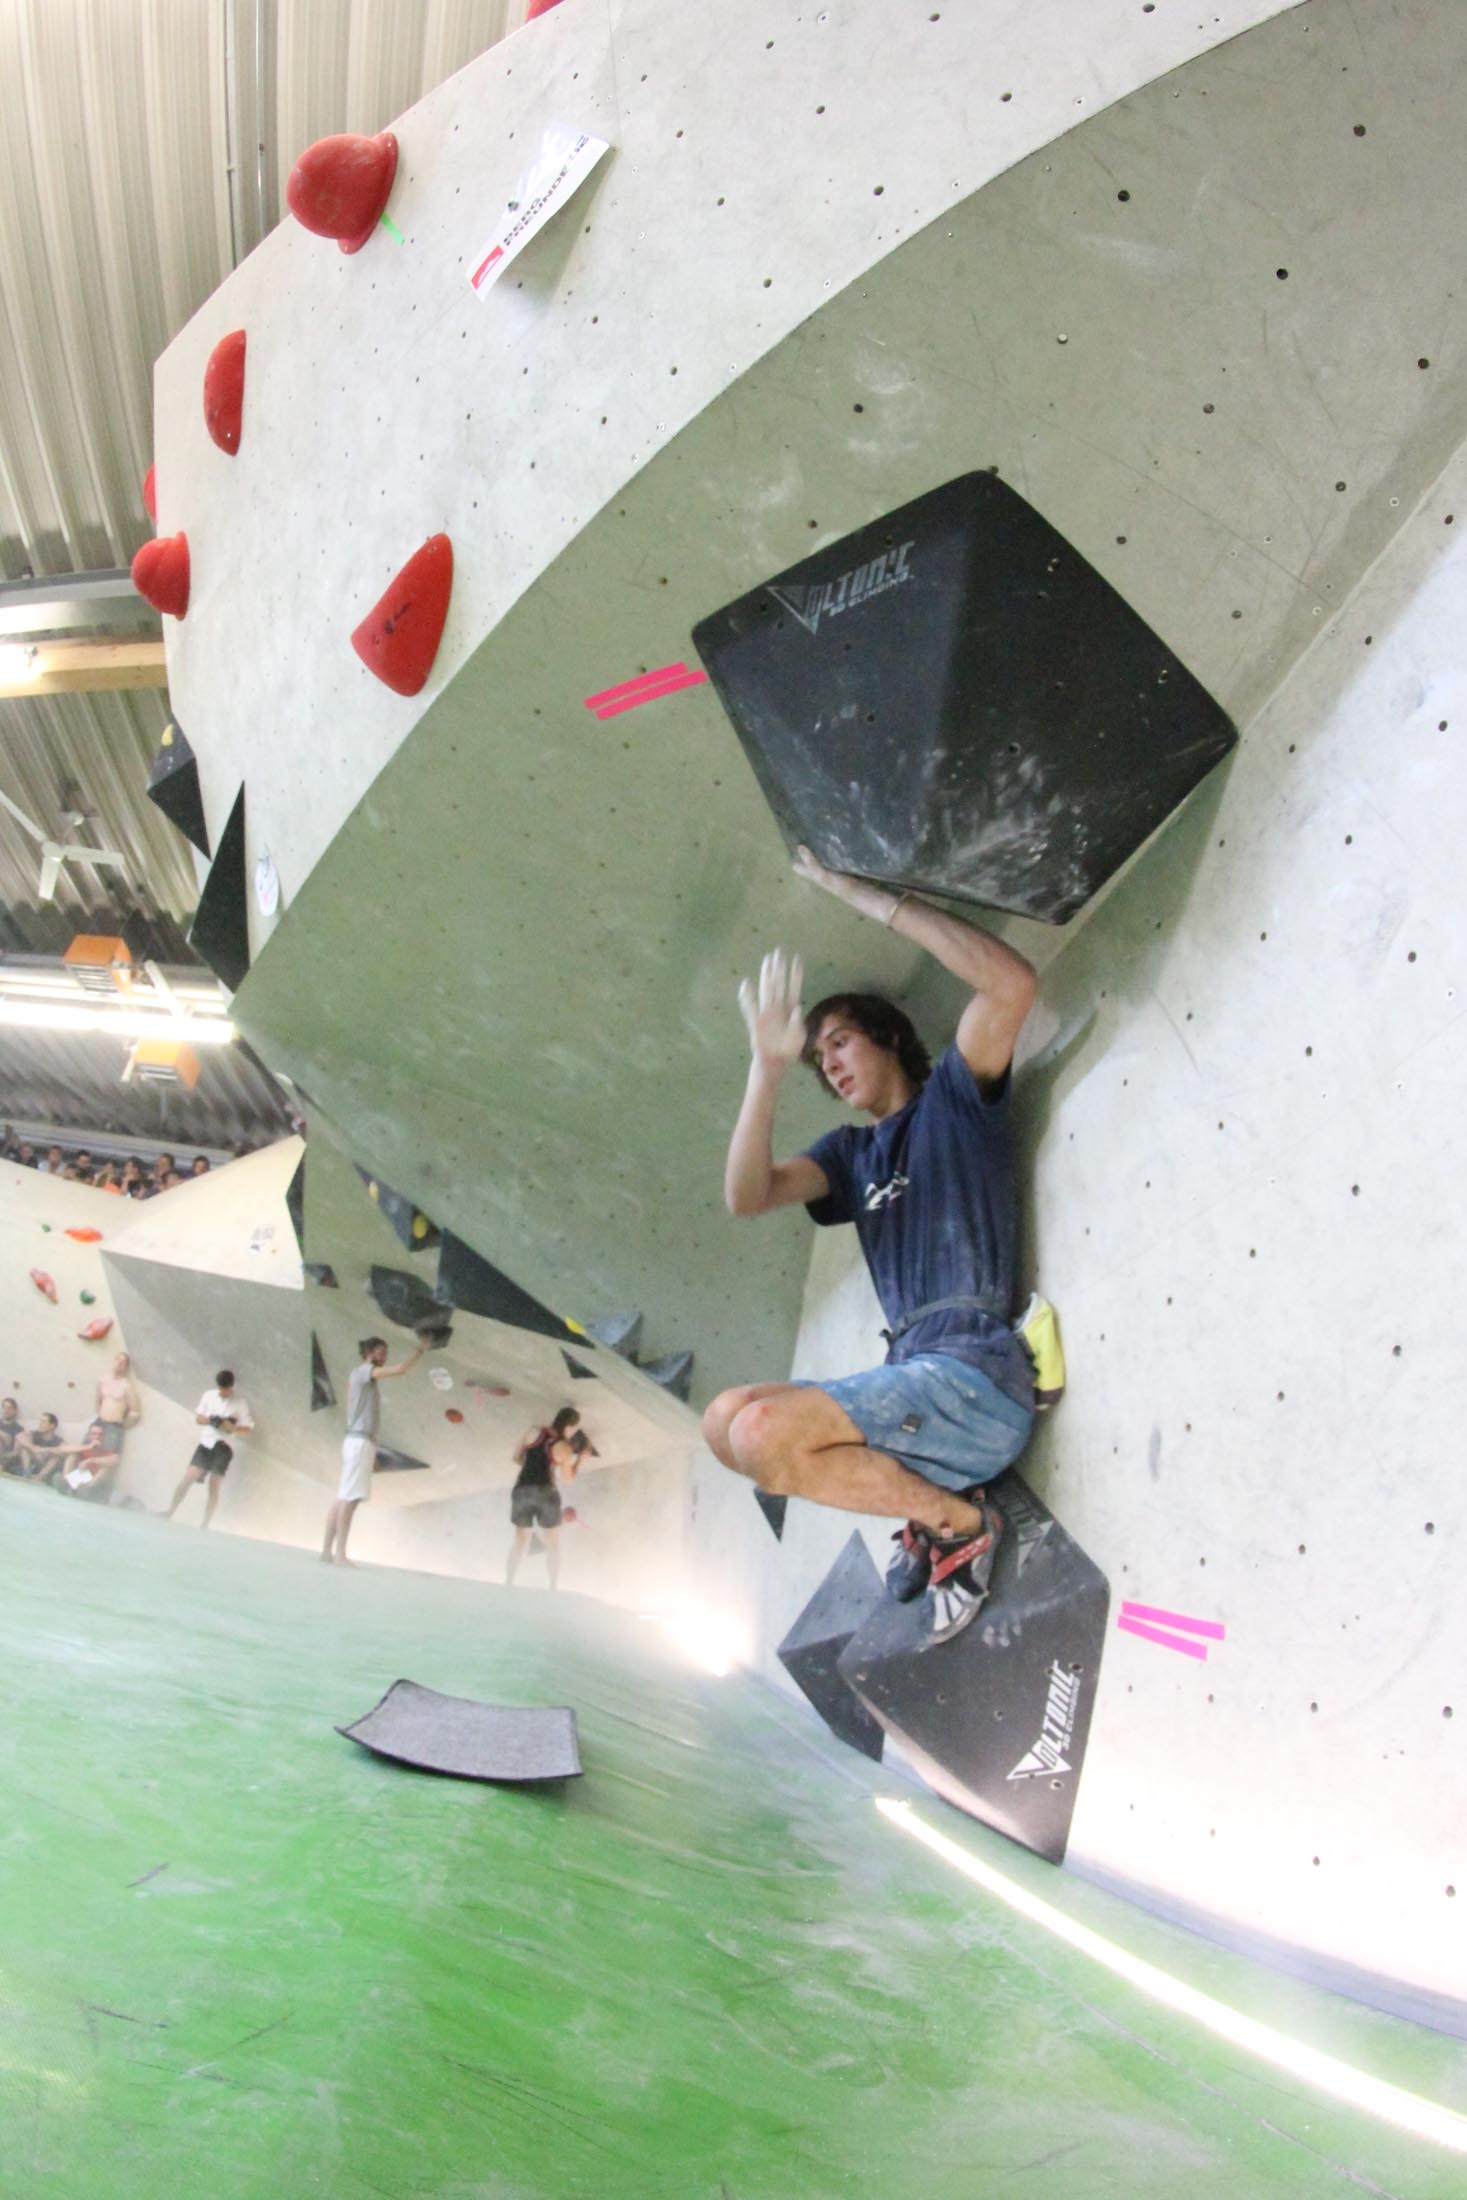 Finale, internationaler bouldercup Frankenjura 2016, BLOCKHELDEN Erlangen, Mammut, Bergfreunde.de, Boulderwettkampf07092016707